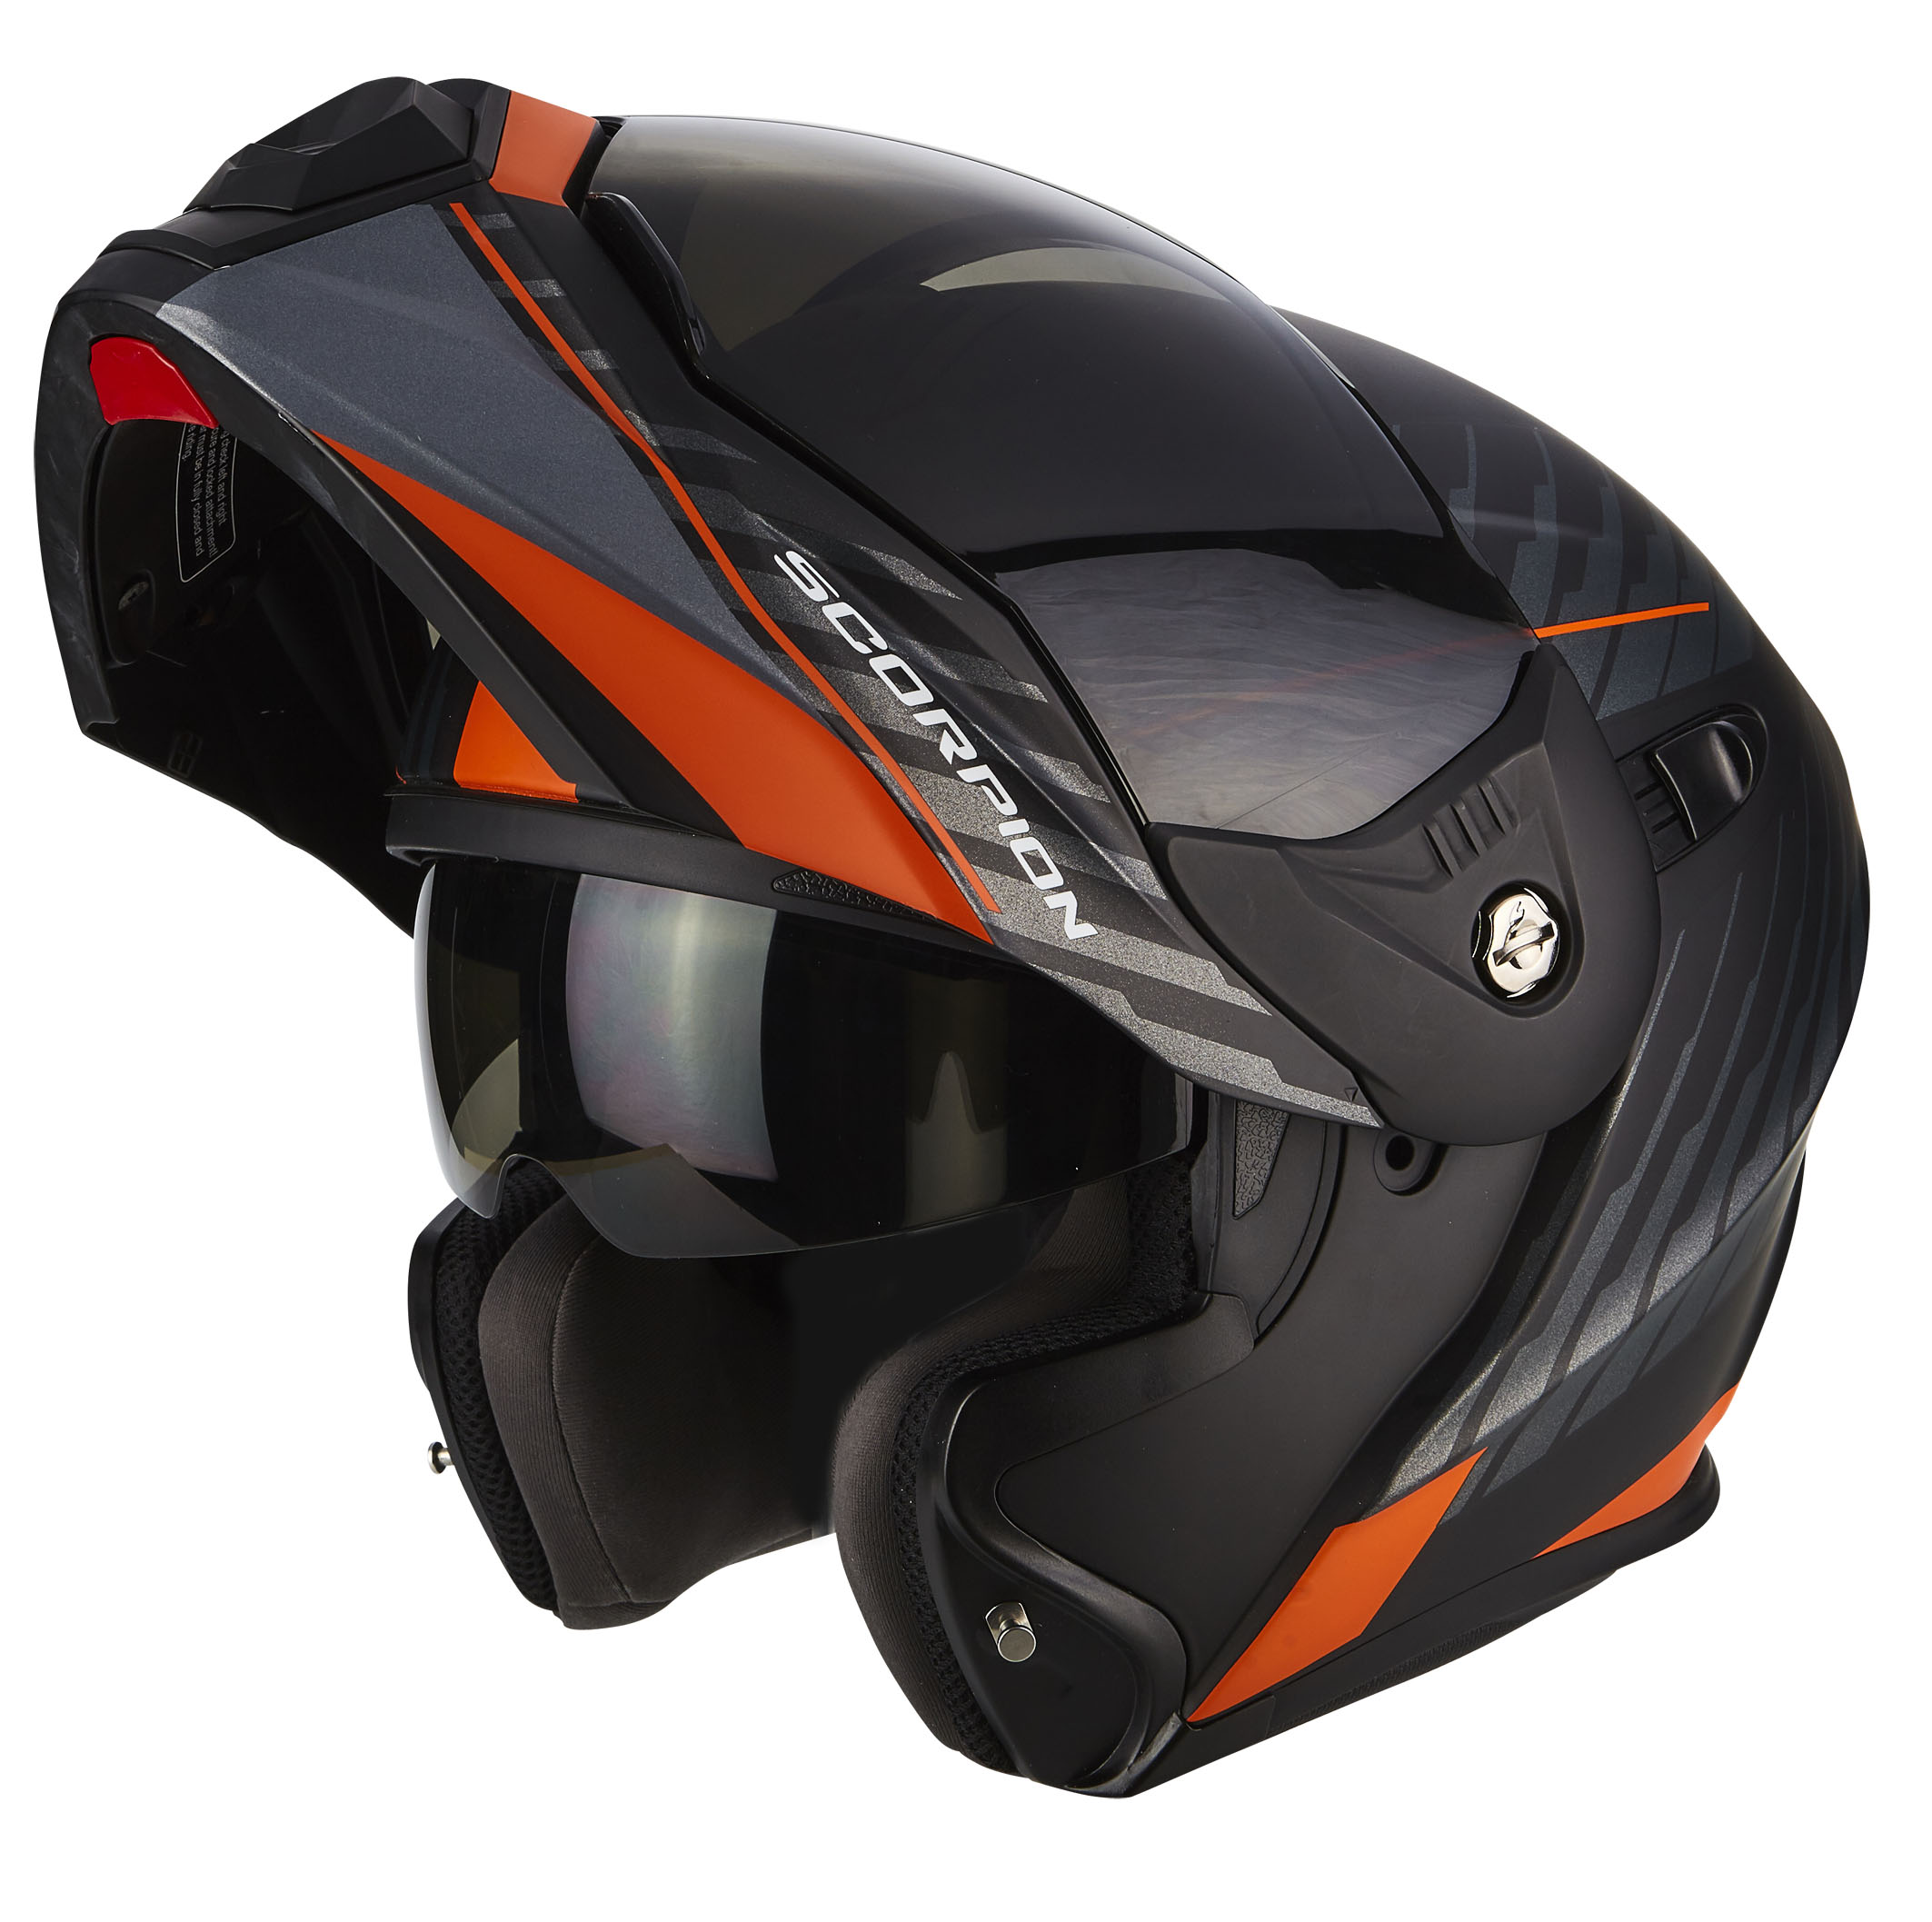 ADX-1 DUAL Matt Black-Silver Orange-Open no visor